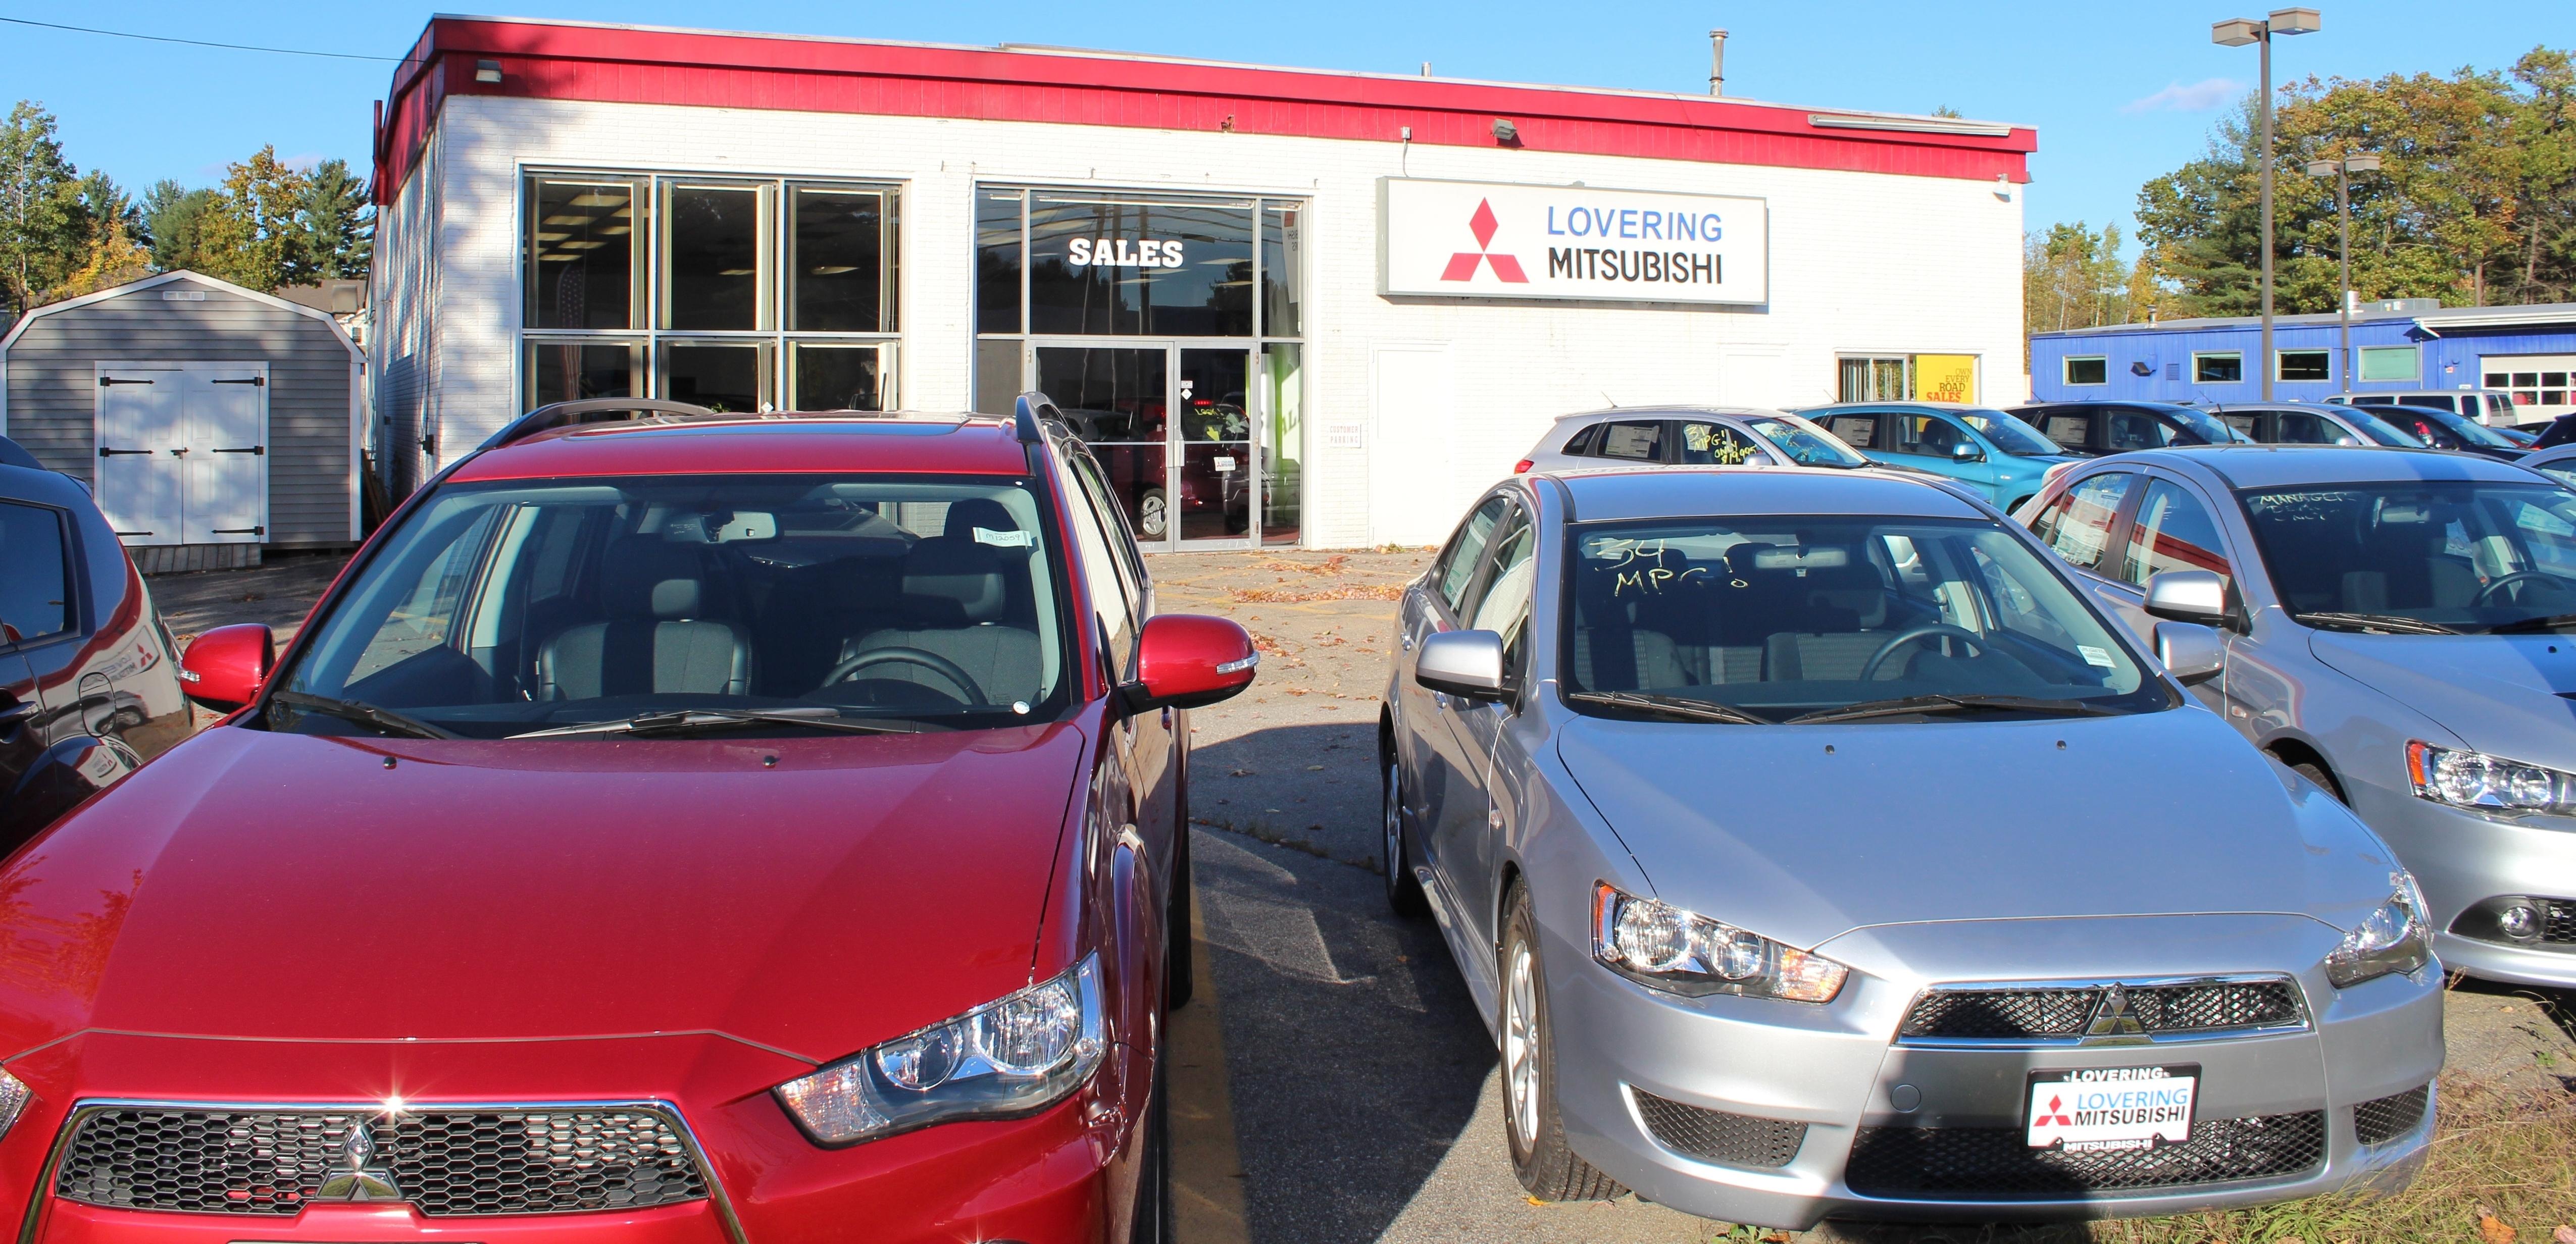 Used Car Dealerships Westminster Colorado